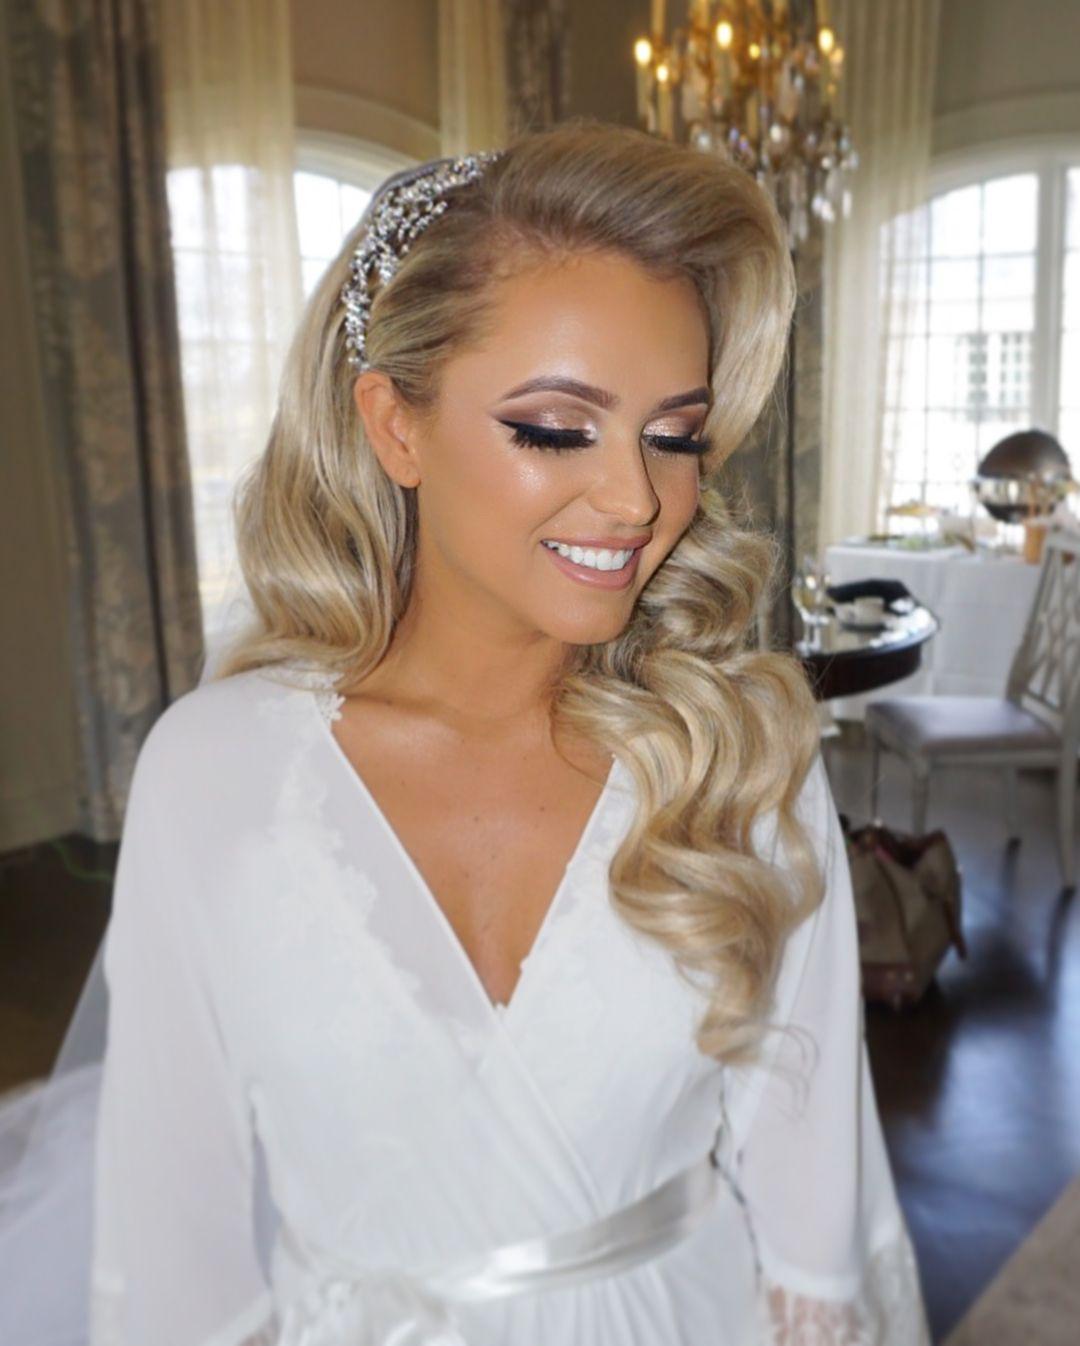 Bridal Glam Makeup By Lauren Damelio Hair By Senadakxo